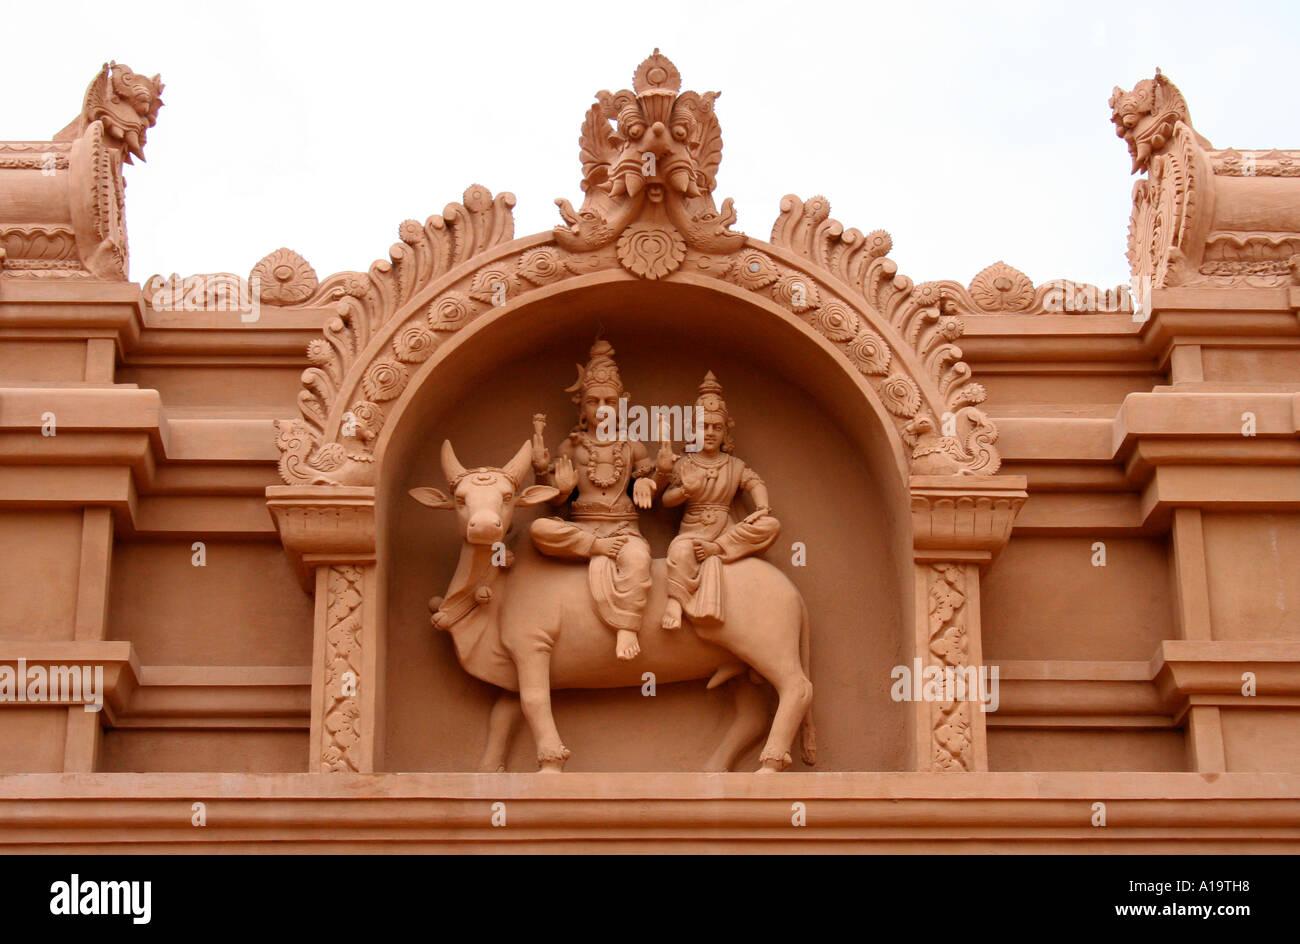 Temple architecture Tamil nadu, India - Stock Image